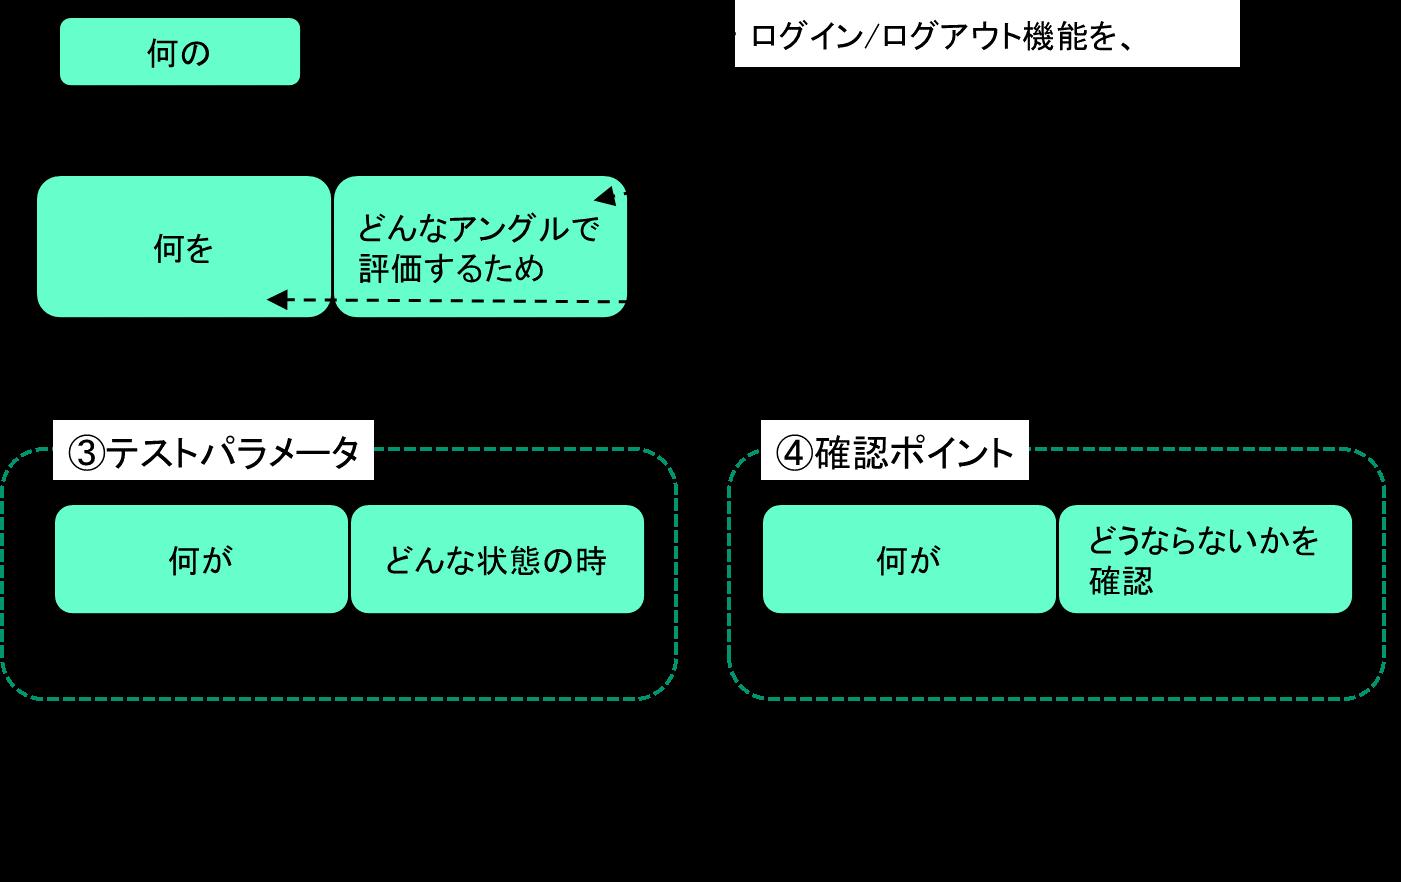 tkmodel1